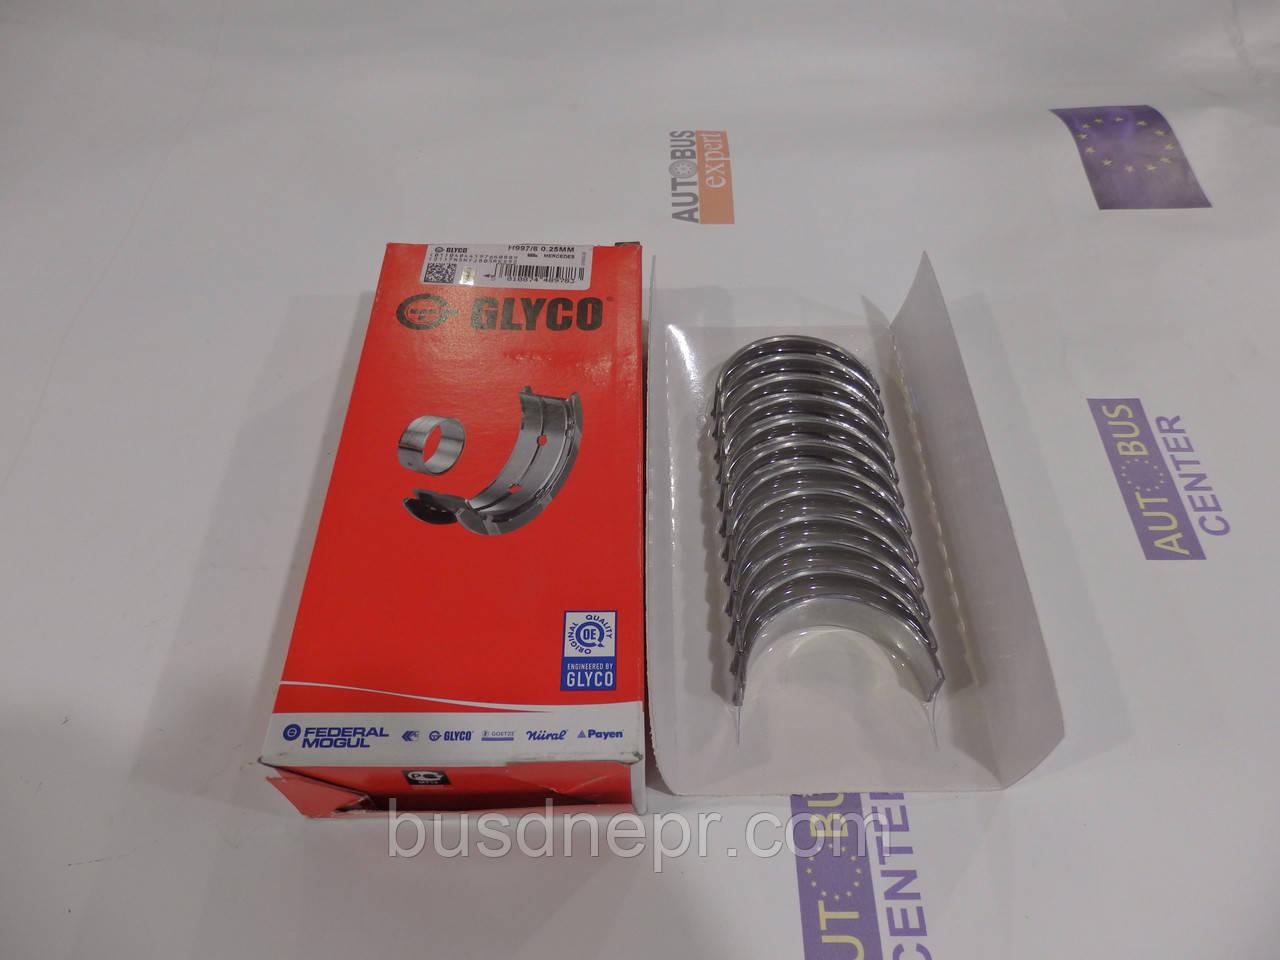 Вкладыши коренные MB Sprinter 2.9TDI (+0.25mm) пр-во GLYCO H997/6 0.25mm